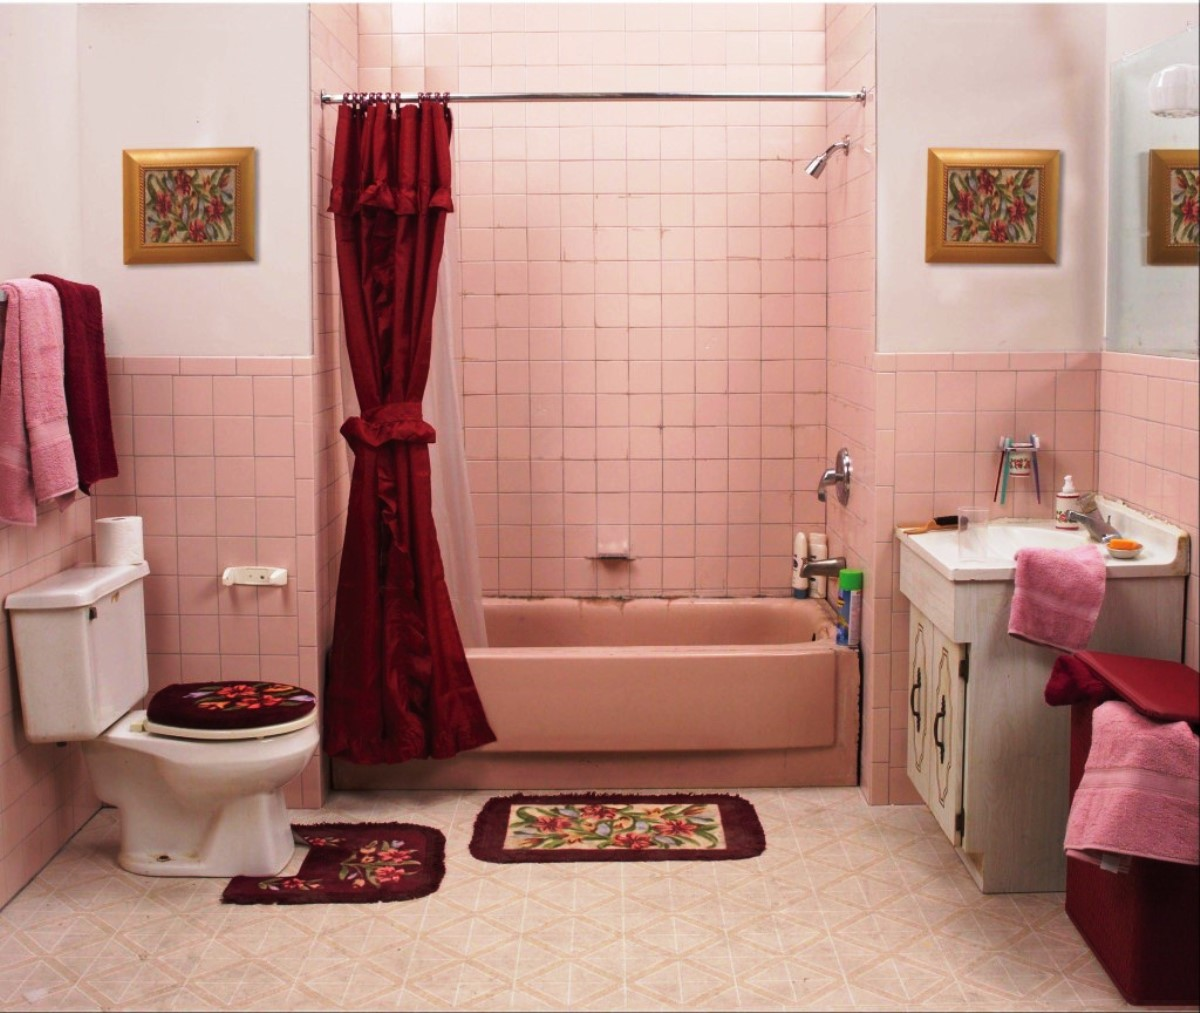 Söt sovsal badrum